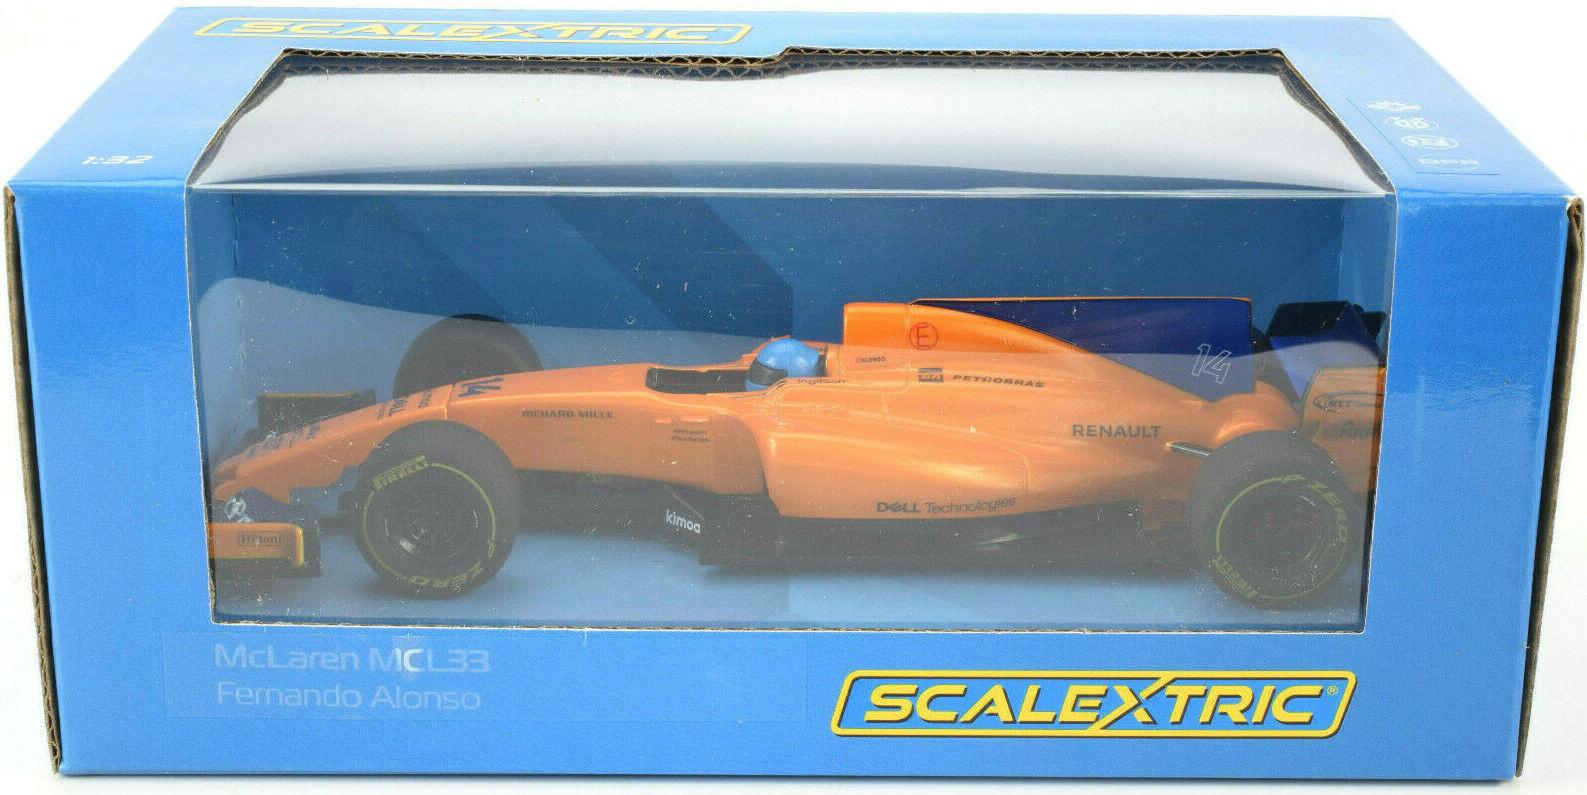 Scalextric McLaren MCL33 - Fernando Fernando Fernando Alonso DPR 1 32 Formula 1 F1 Slot Car C4022 79a9be